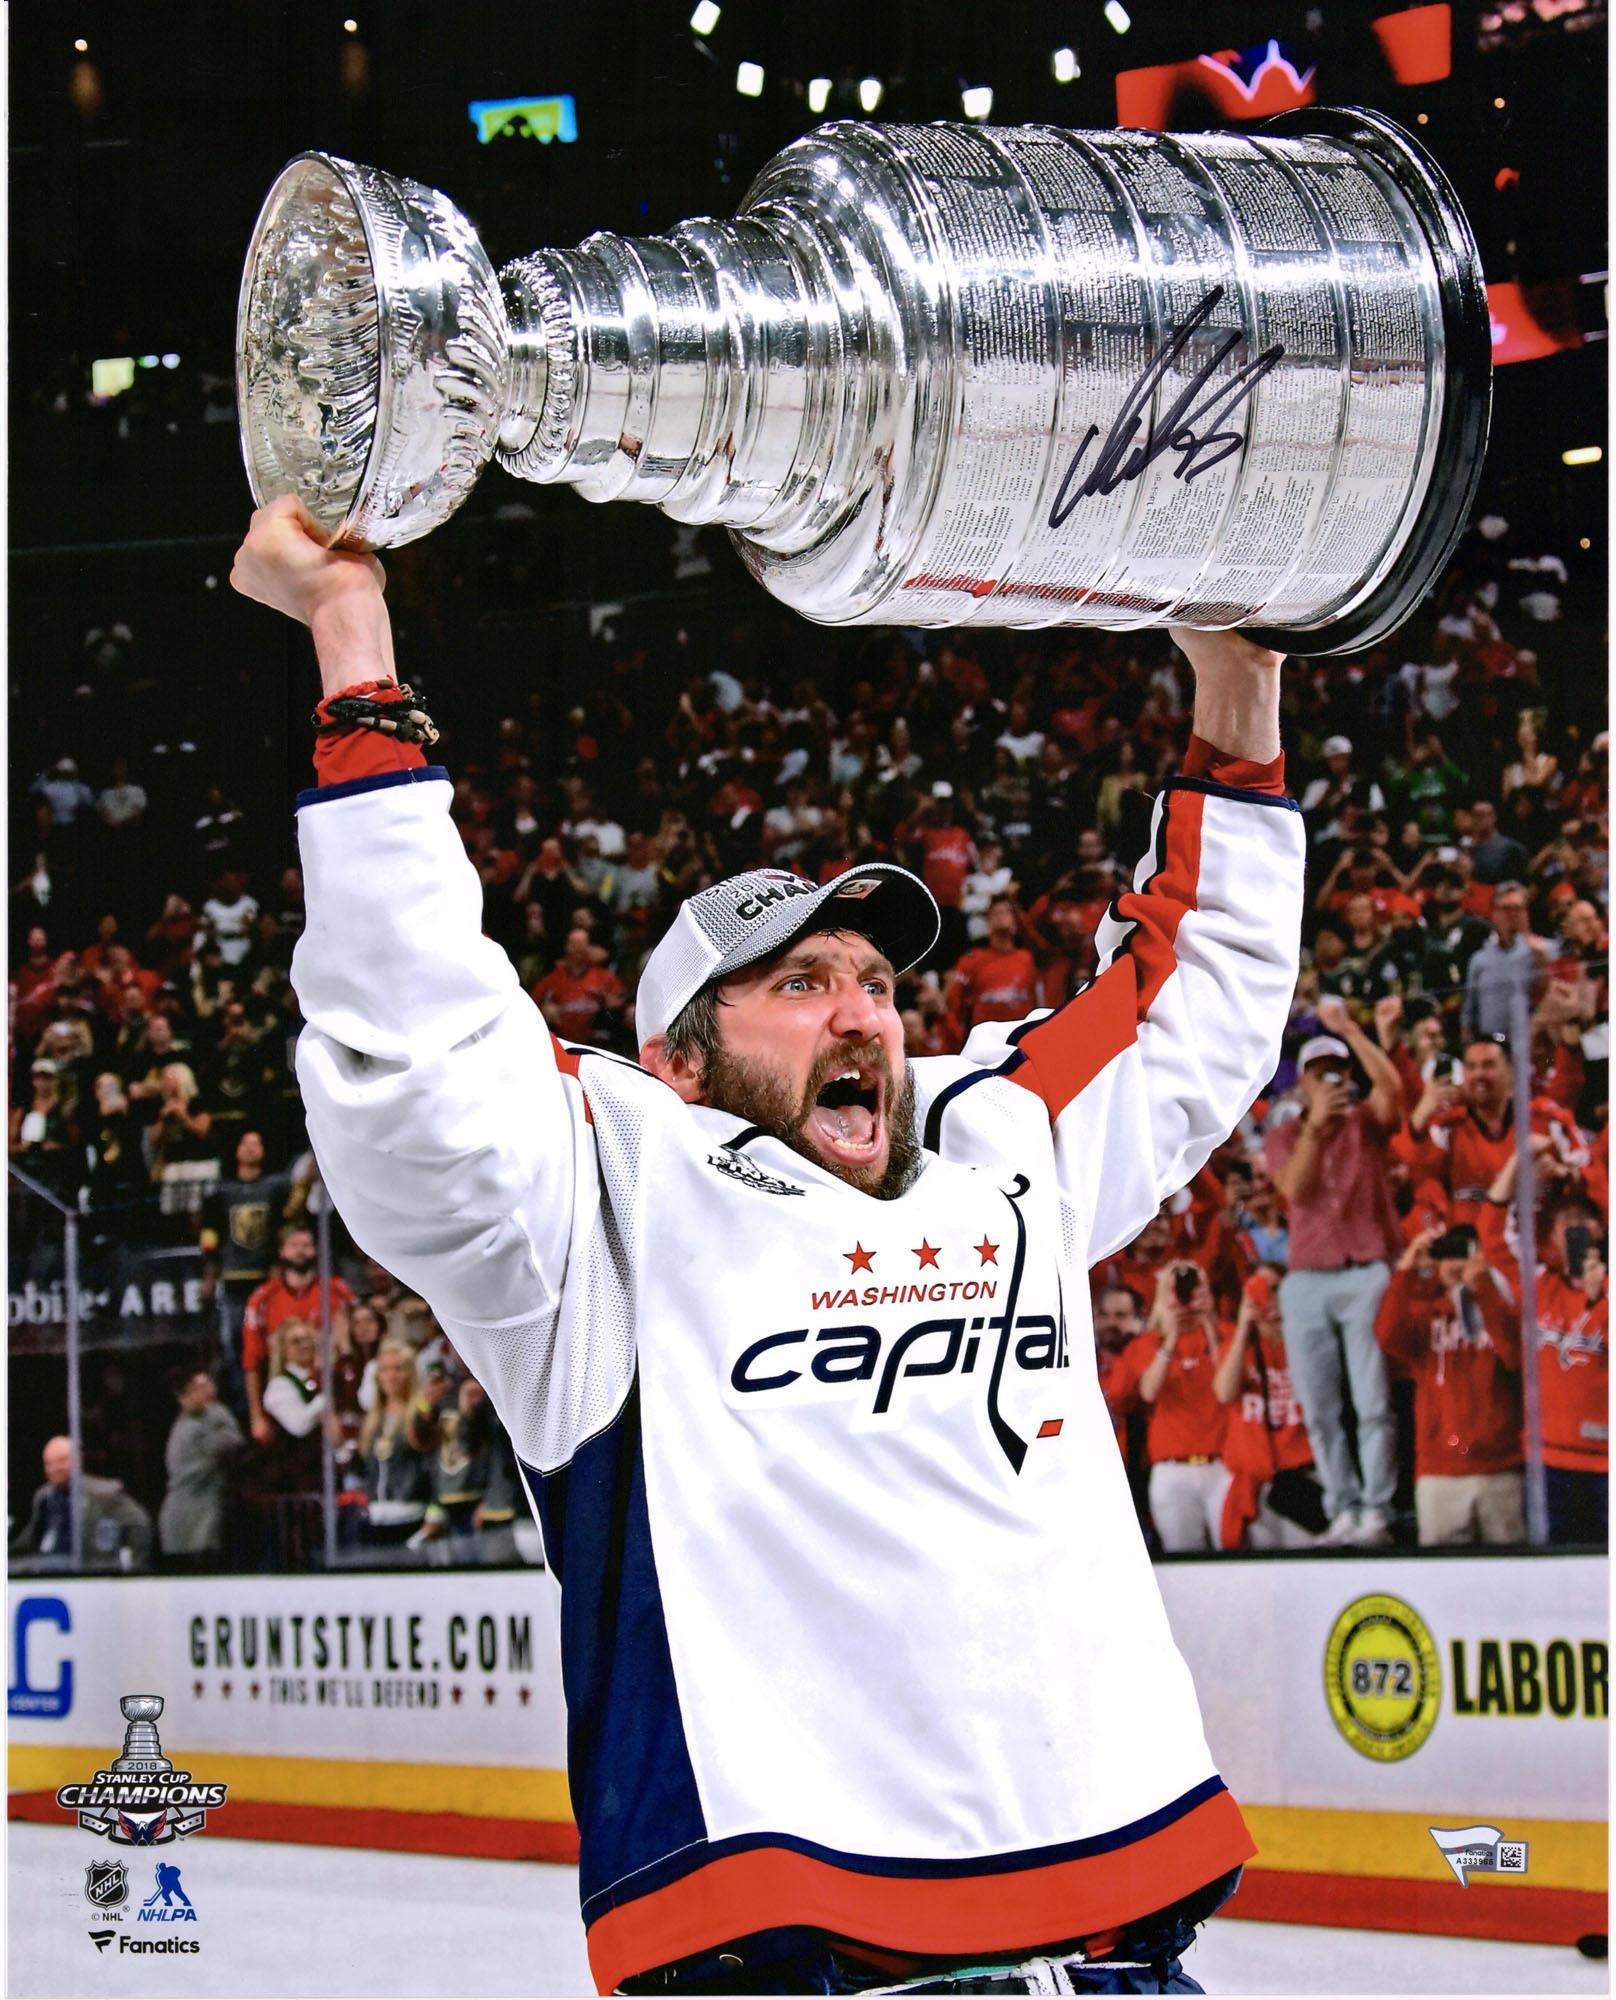 "Alex Ovechkin Washington Capitals 2018 Stanley Cup Champions Autographed 16"" x 20"" Raising Cup Photograph Fanatics Authentic Certified"